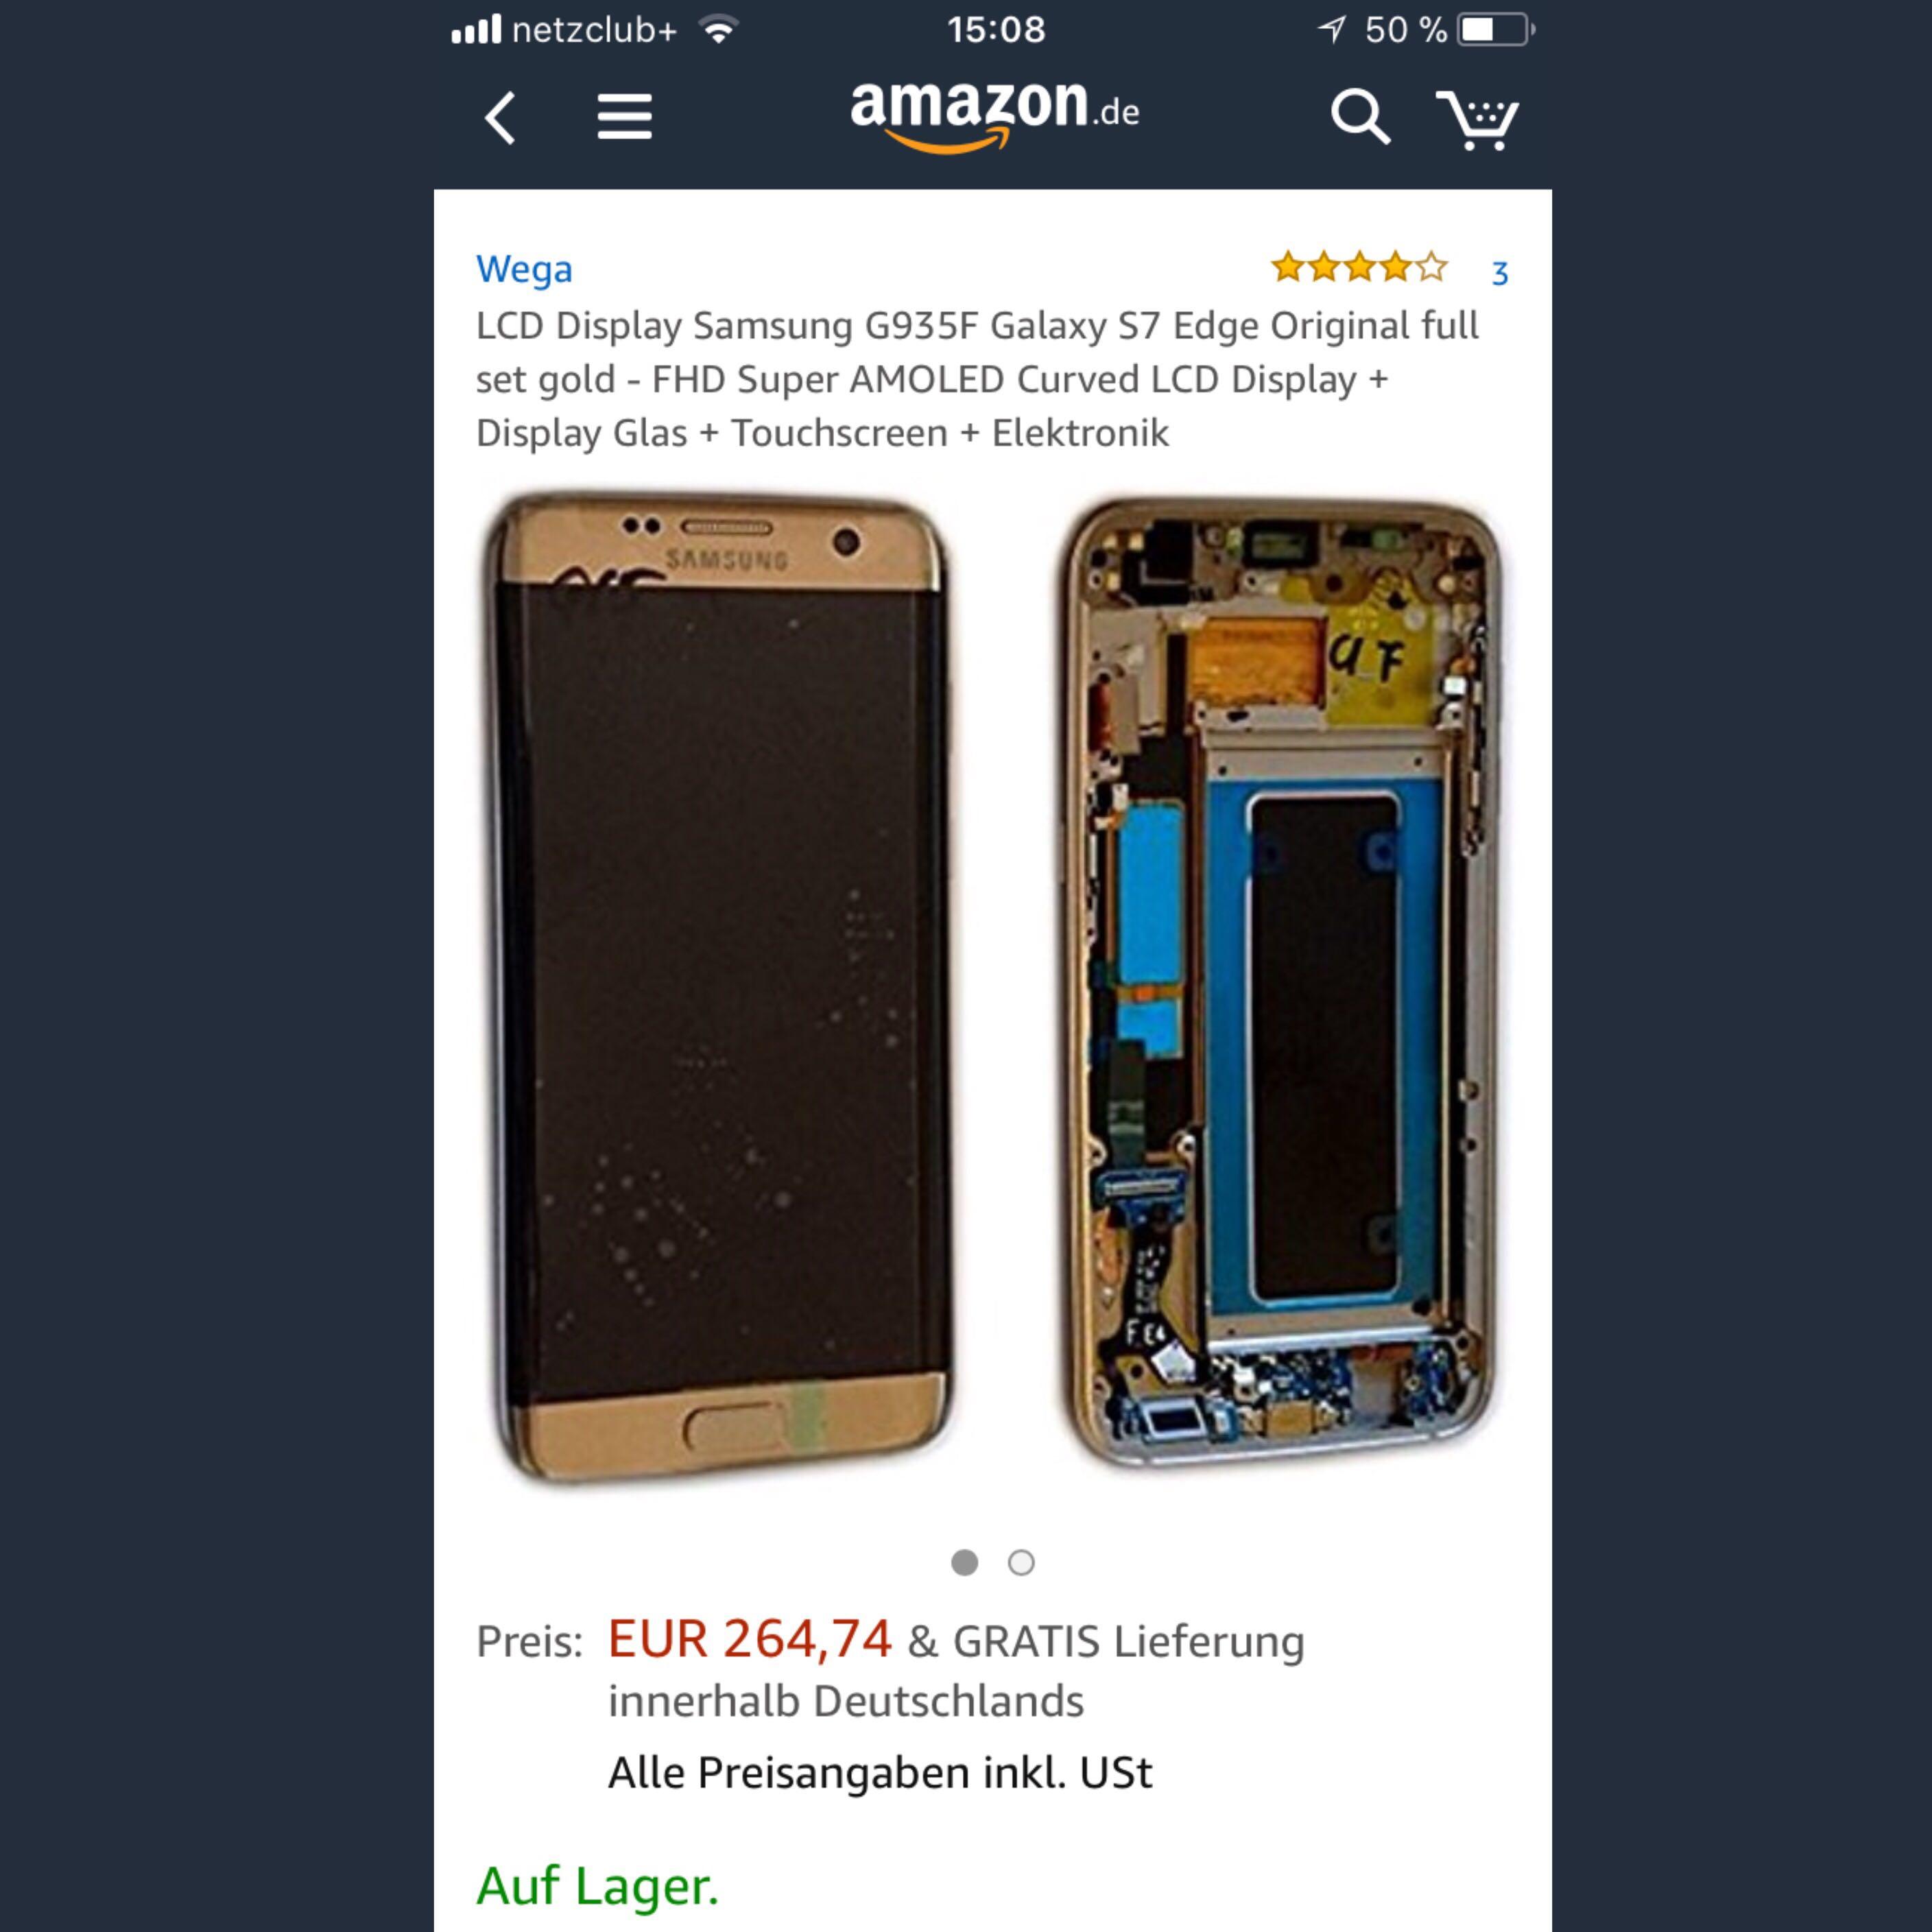 Komplettes Galaxy S7 Edge Selbst Zusammenbauen Handy Technik Apple Lcd Touchscreen Samsung Gold Original